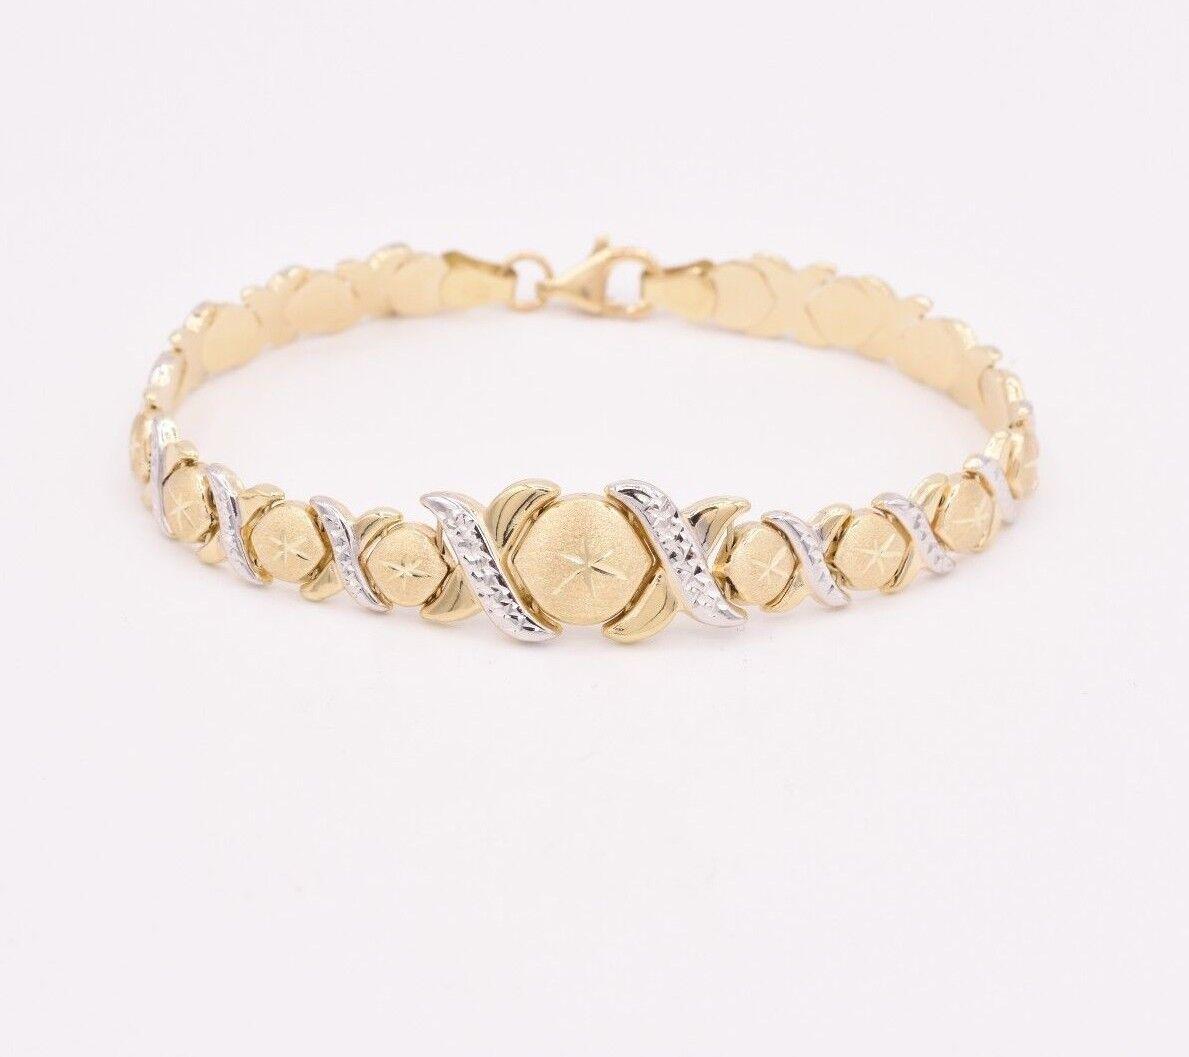 7.5  Diamond Cut Hugs & Kisses Bracelet Real 10K Yellow White Two-Tone gold XOXO